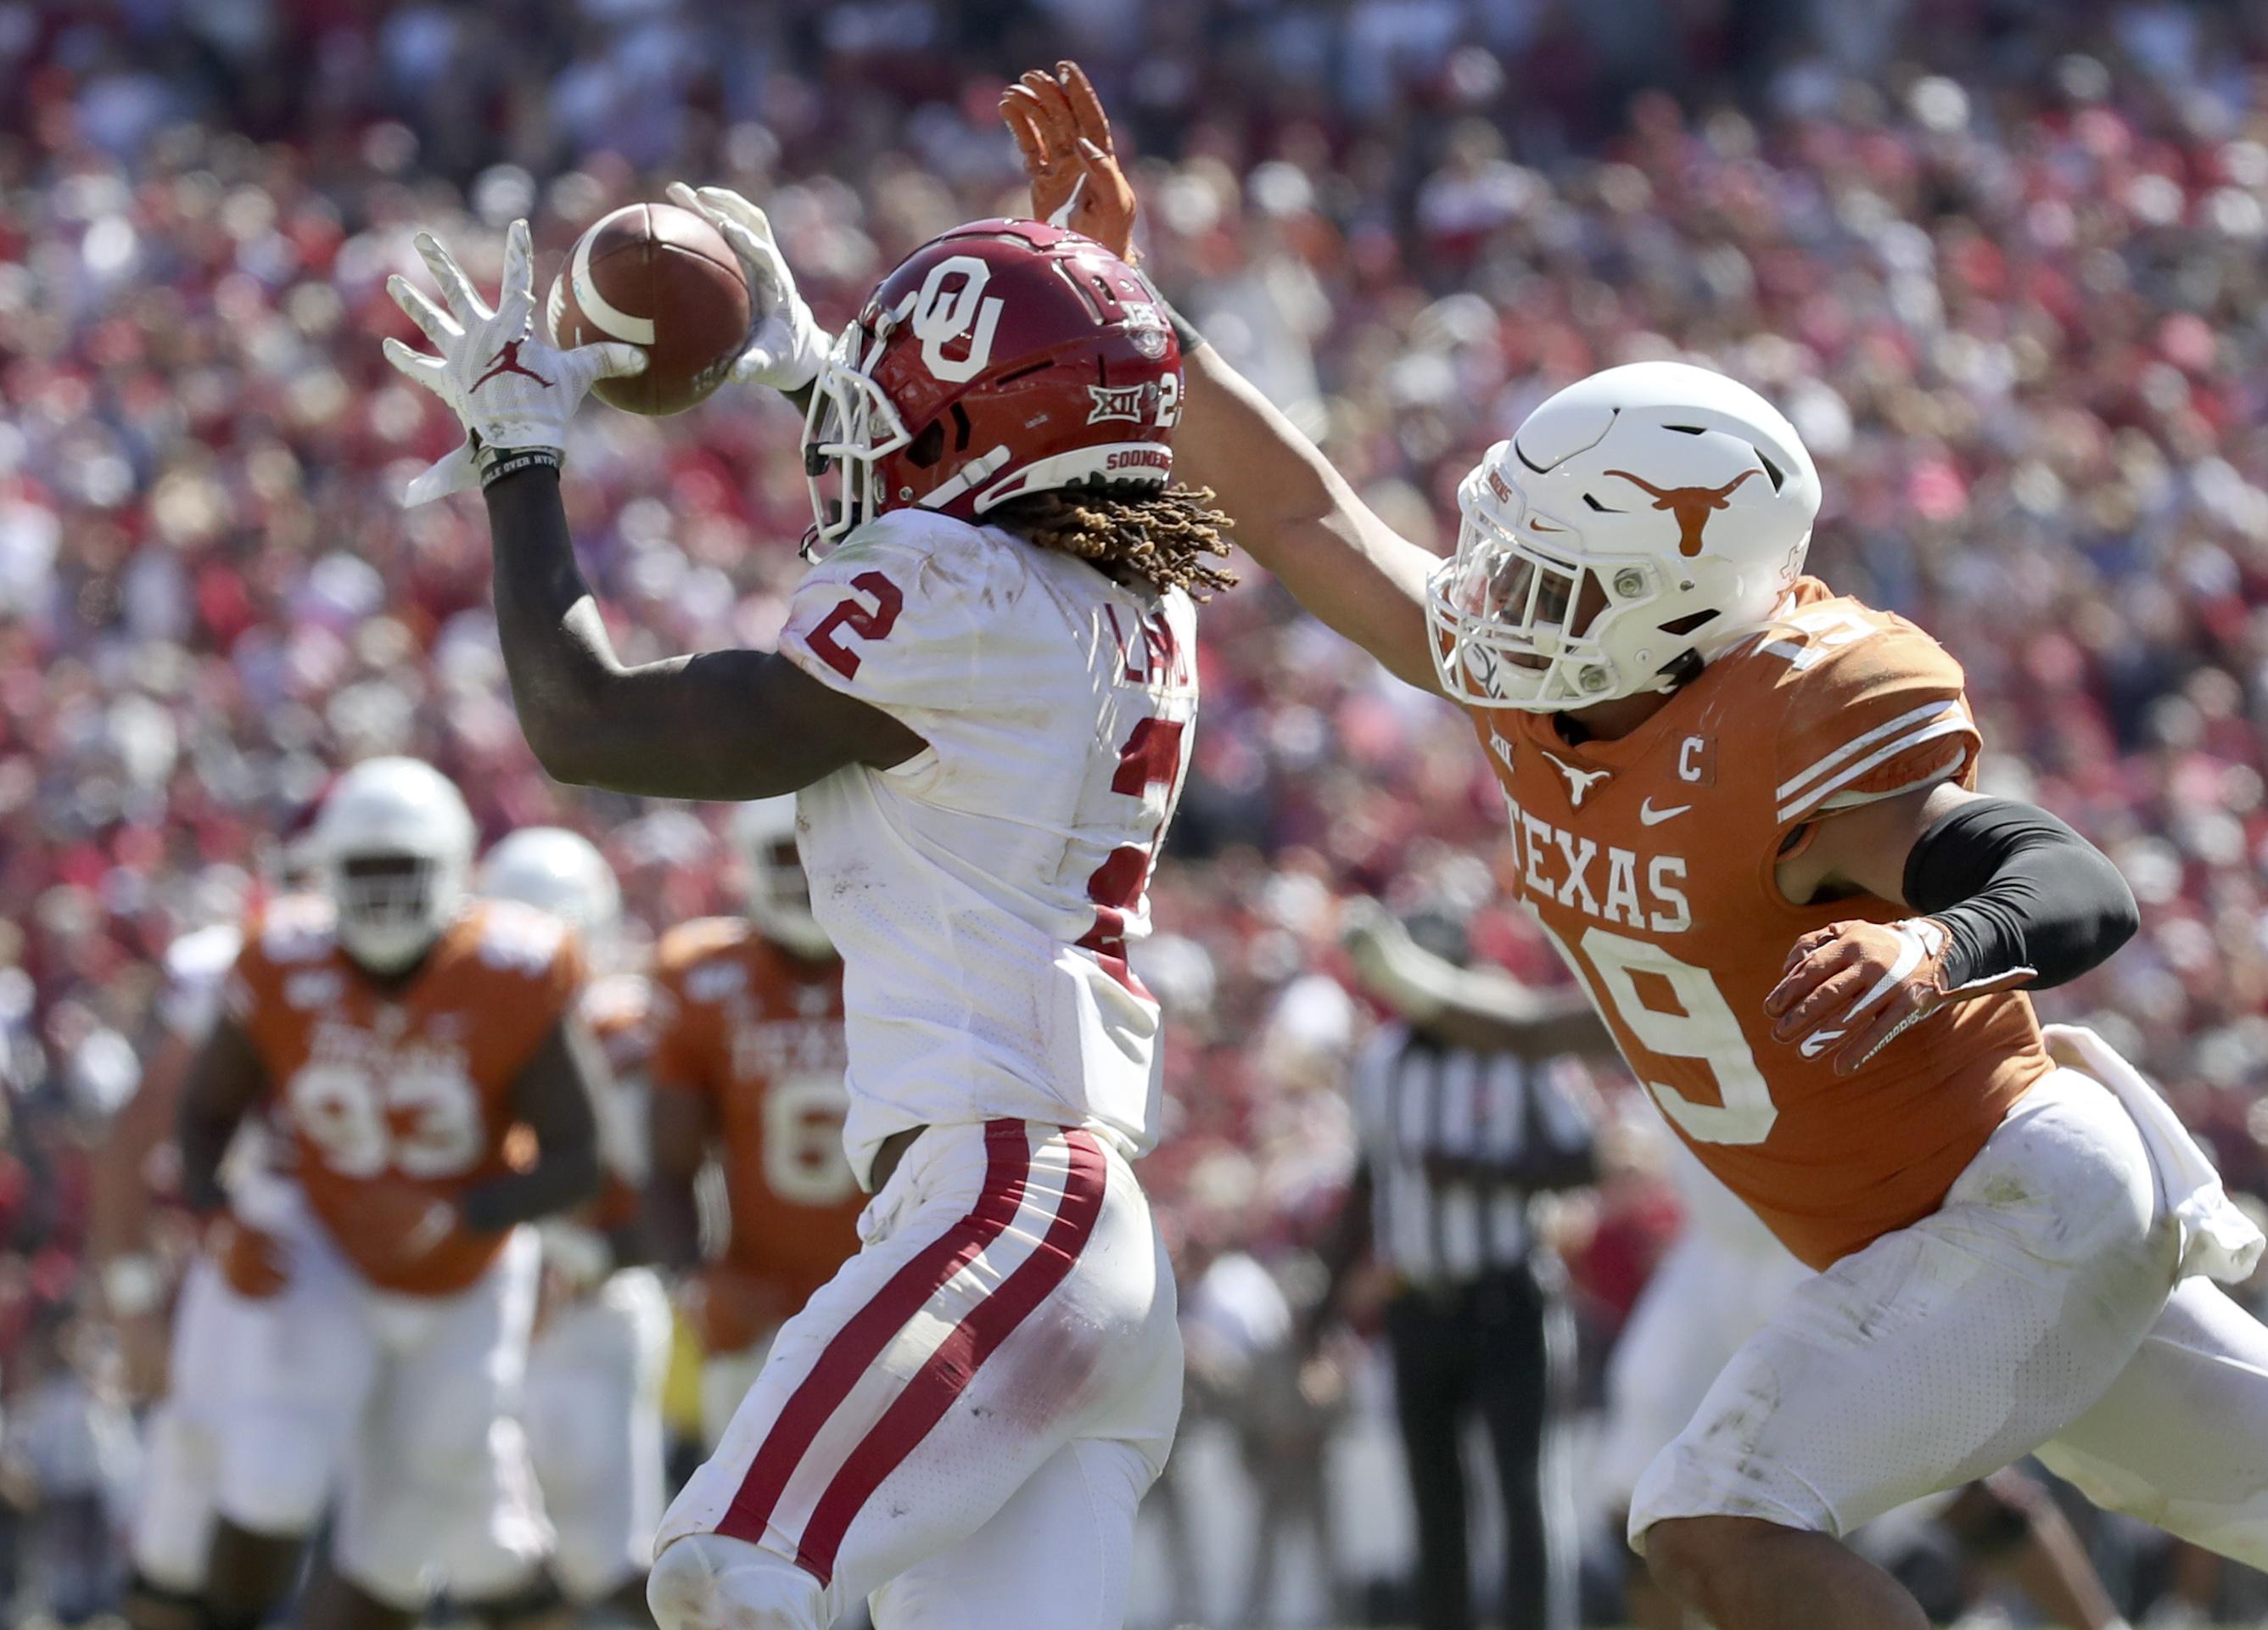 Texas Football: Brandon Jones' Film Study Ahead of the NFL Combine Goes Above and Beyond